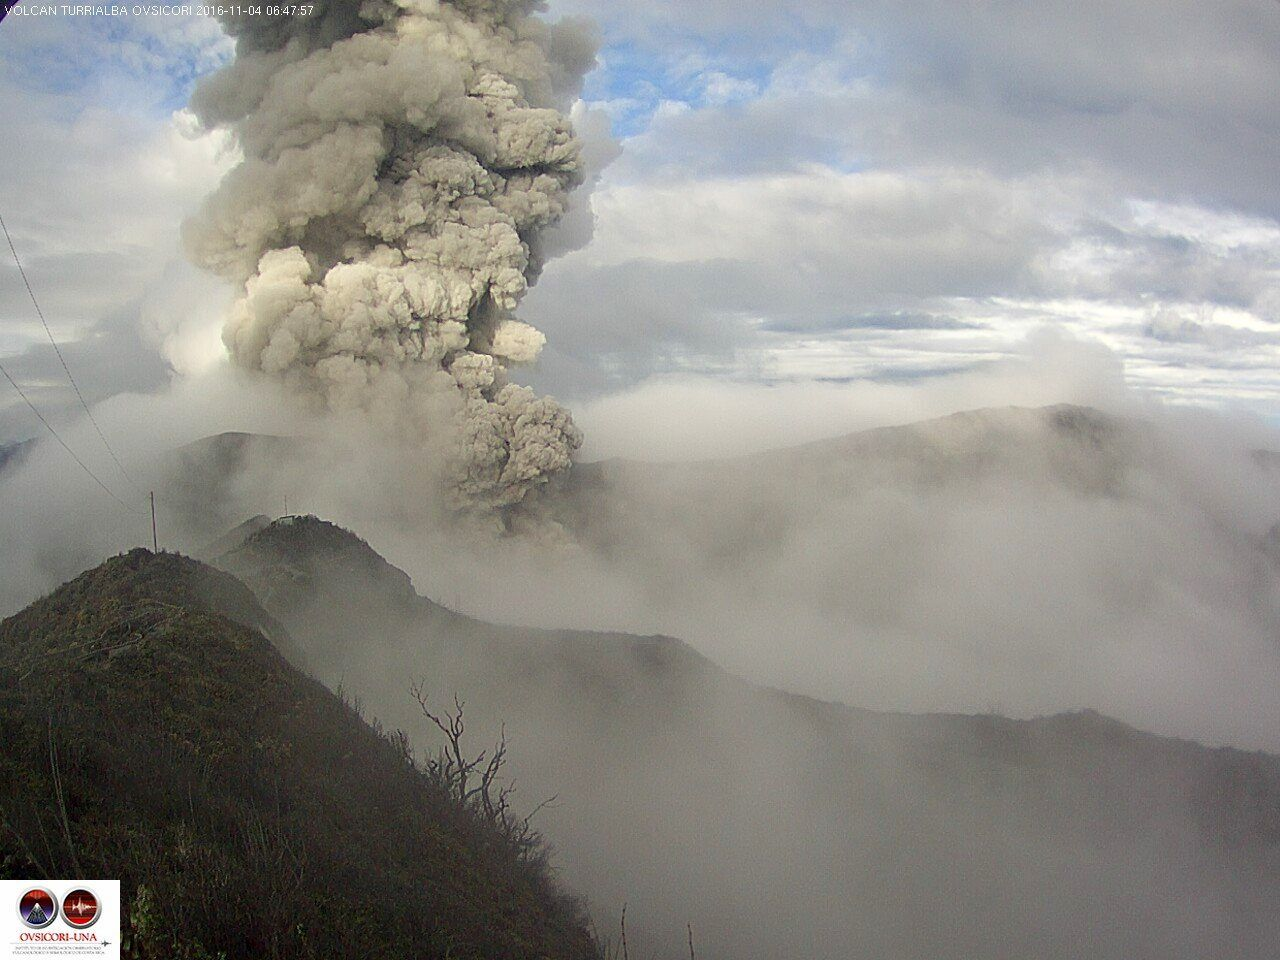 Turrialba - Ash emission from 04.11.2016 / 6:48 - webcam Ovsicori